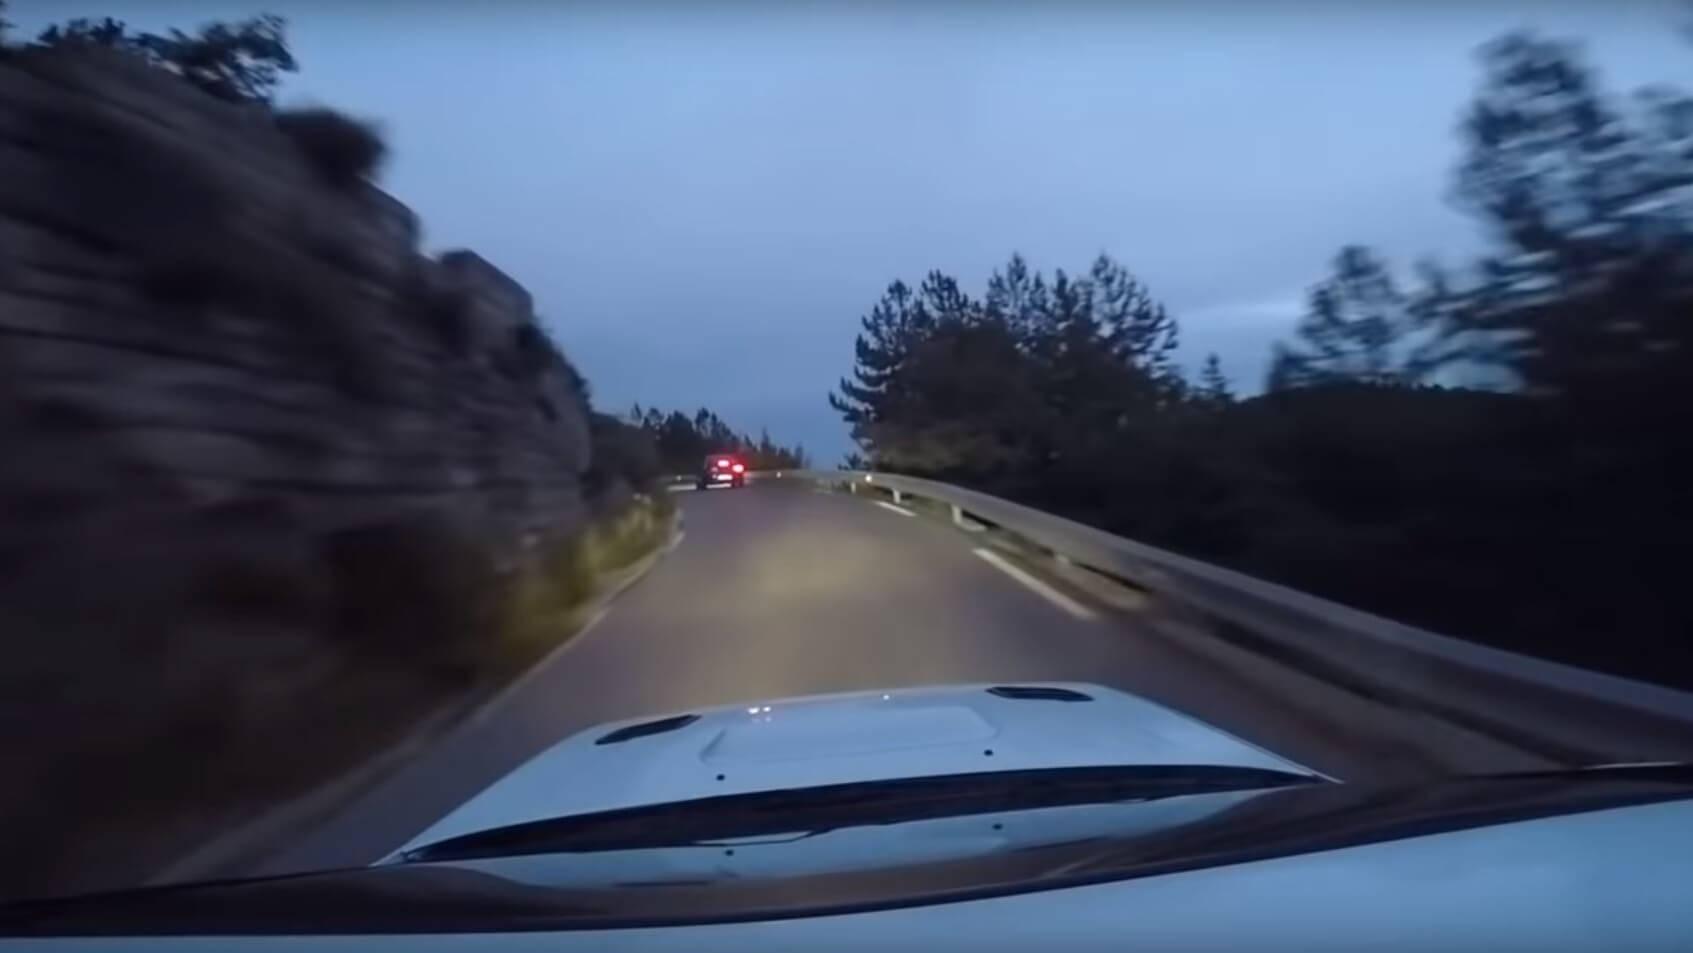 Subaru Impreza WRX STI Touge Rennen AUTODROM Magazin Fahrkultur Youngtimer